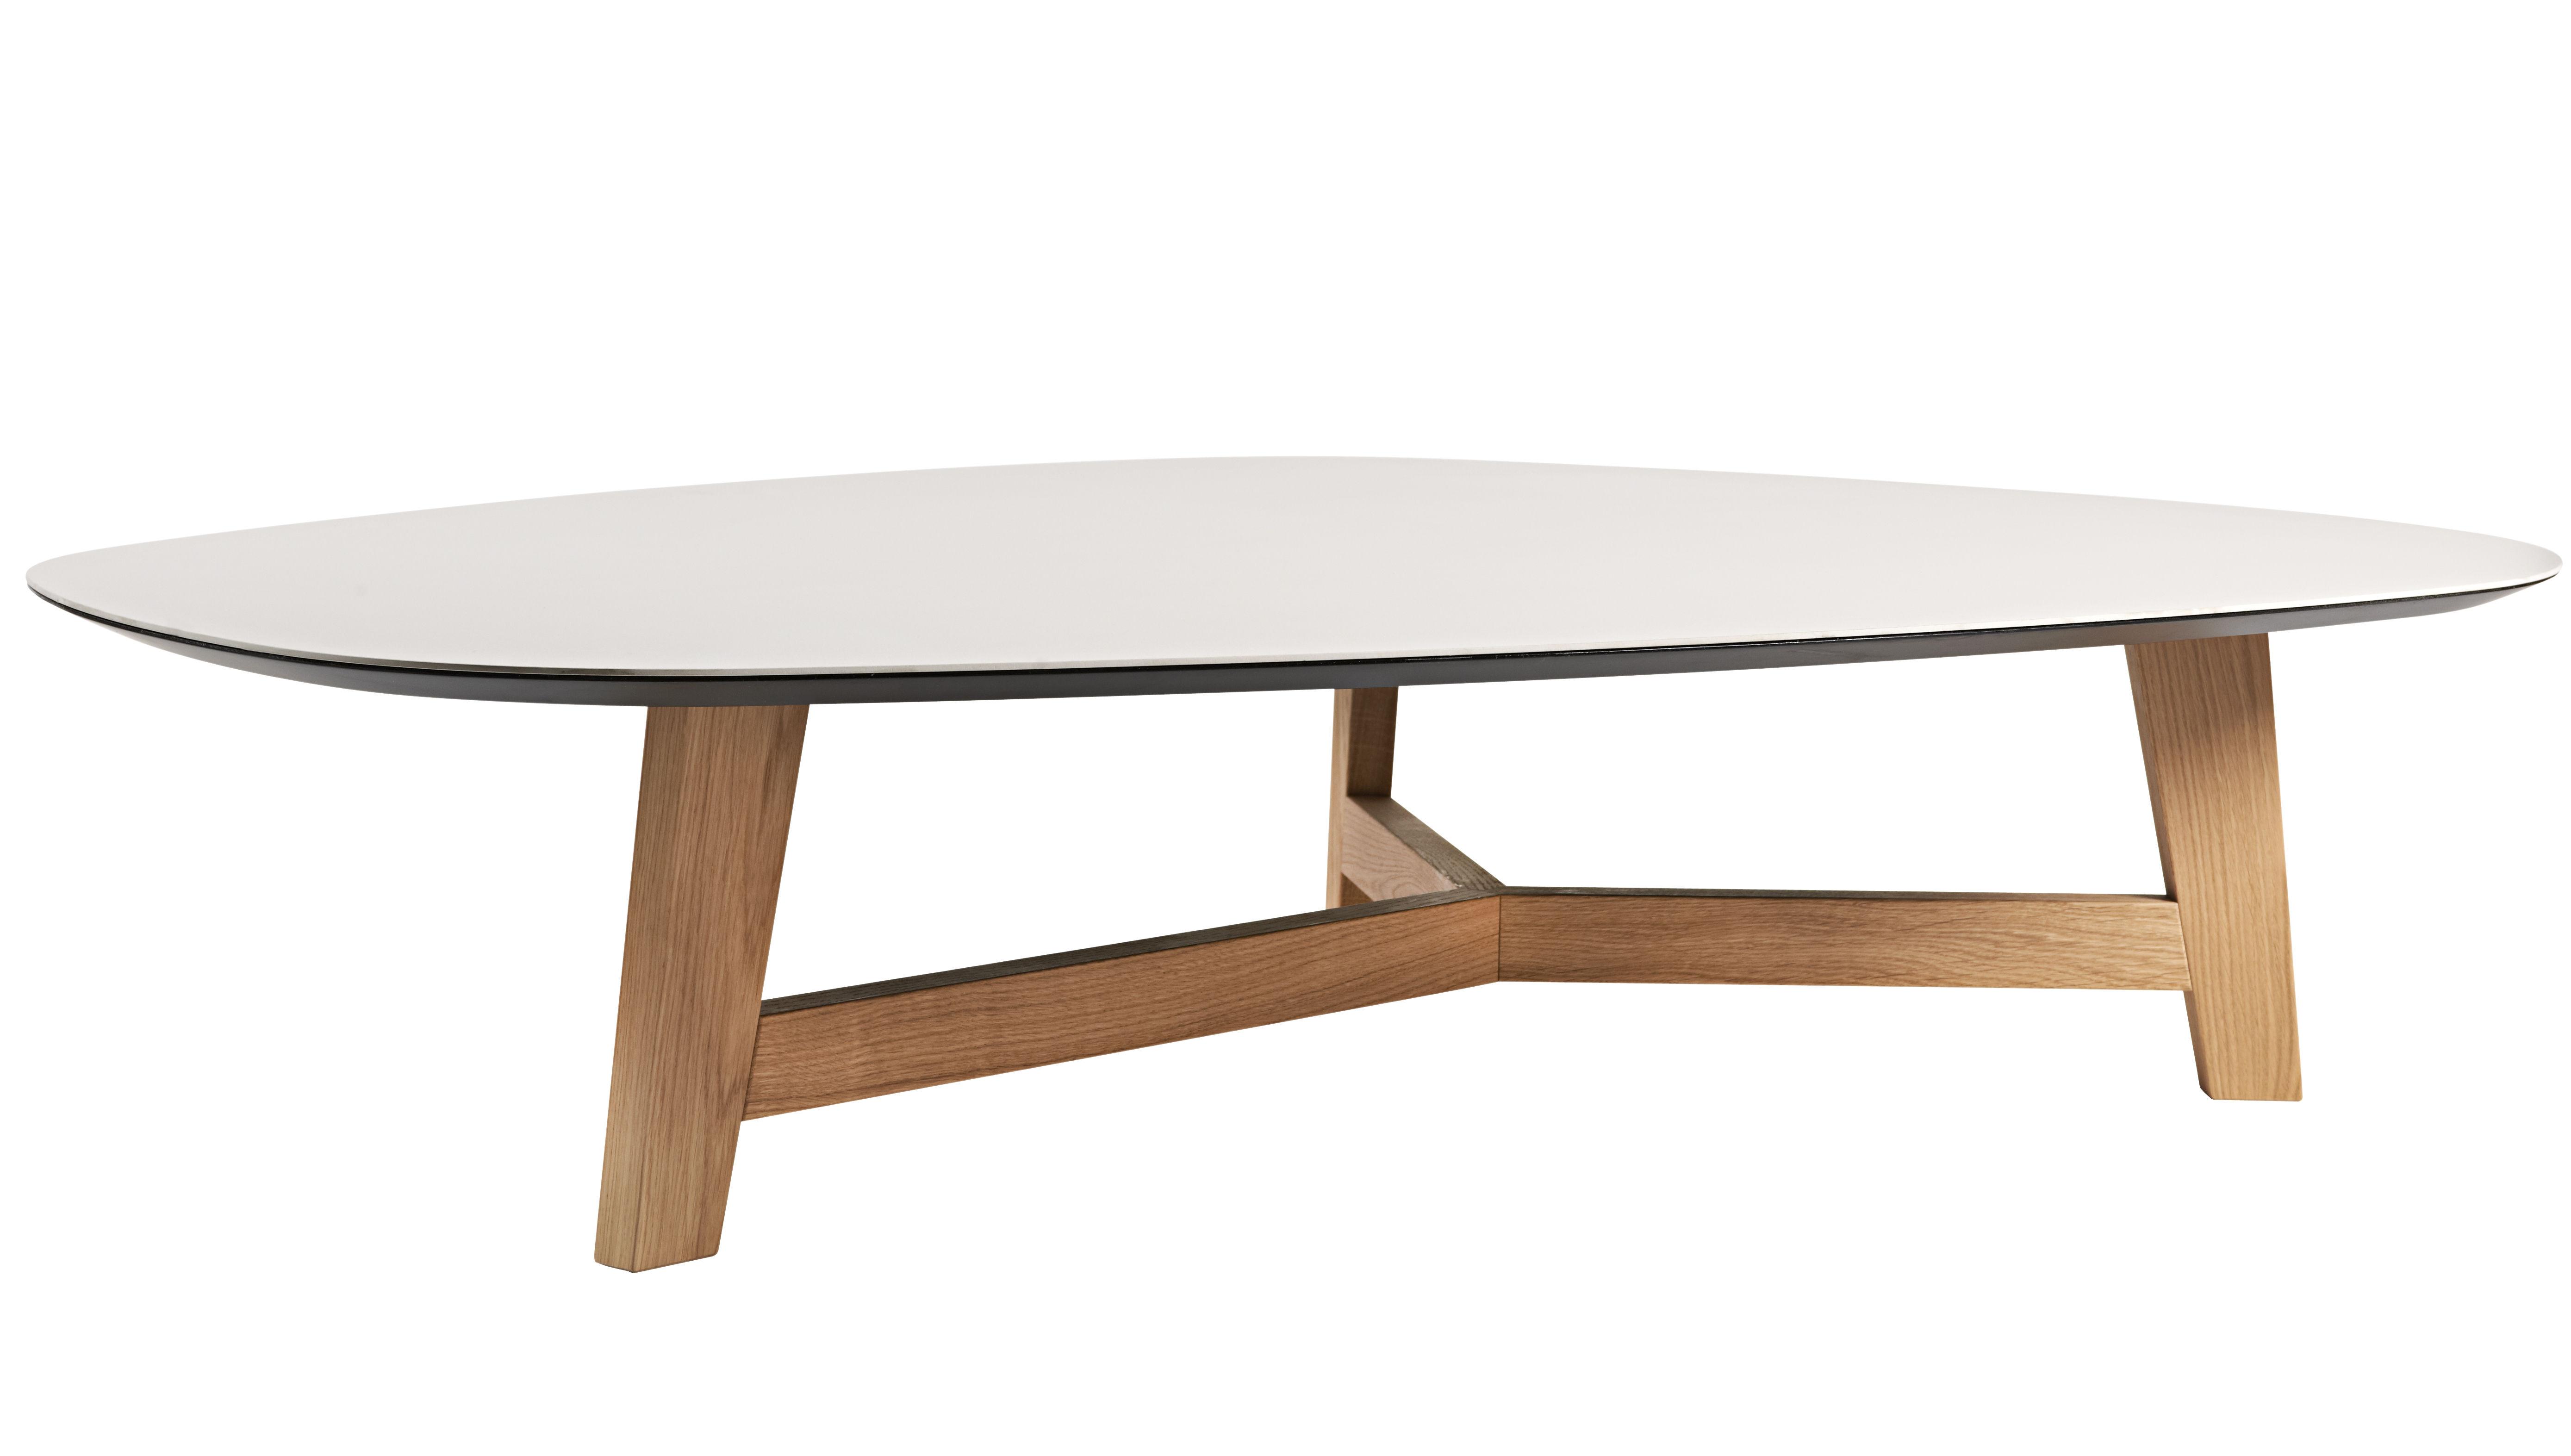 Table En Bois Chene Clair table basse t-phoenix / grand plateau - pied chêne - moroso